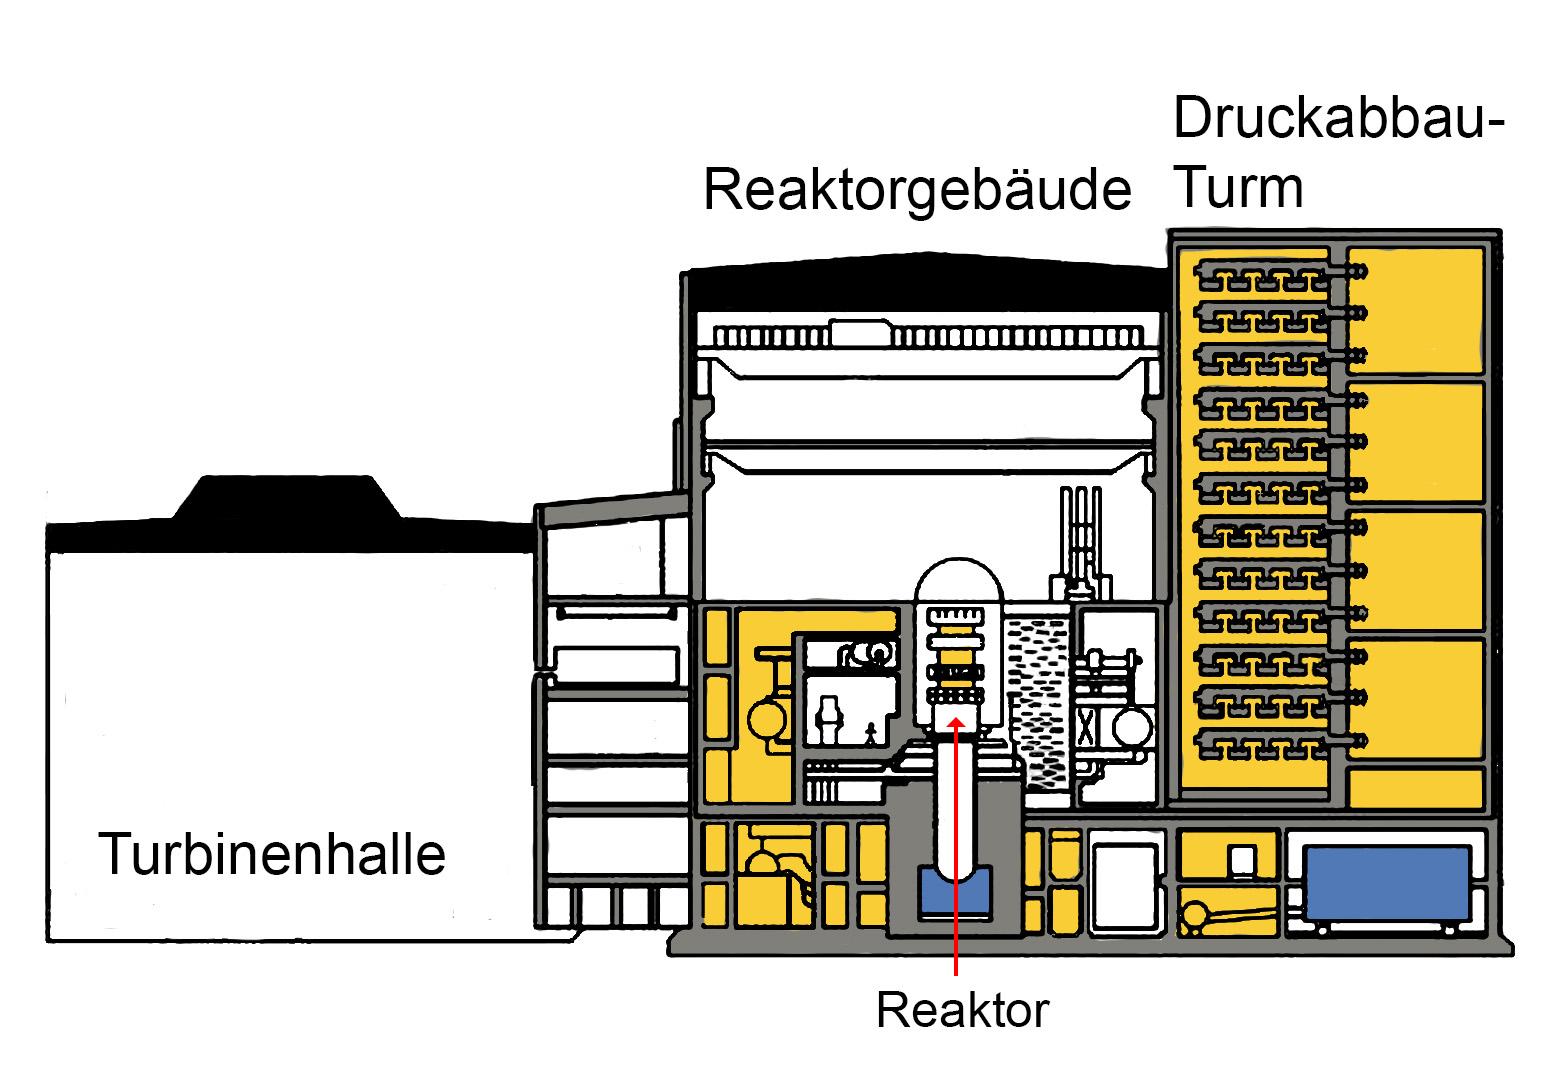 Querschnitt des Reaktorgebäudes Mochovce 3